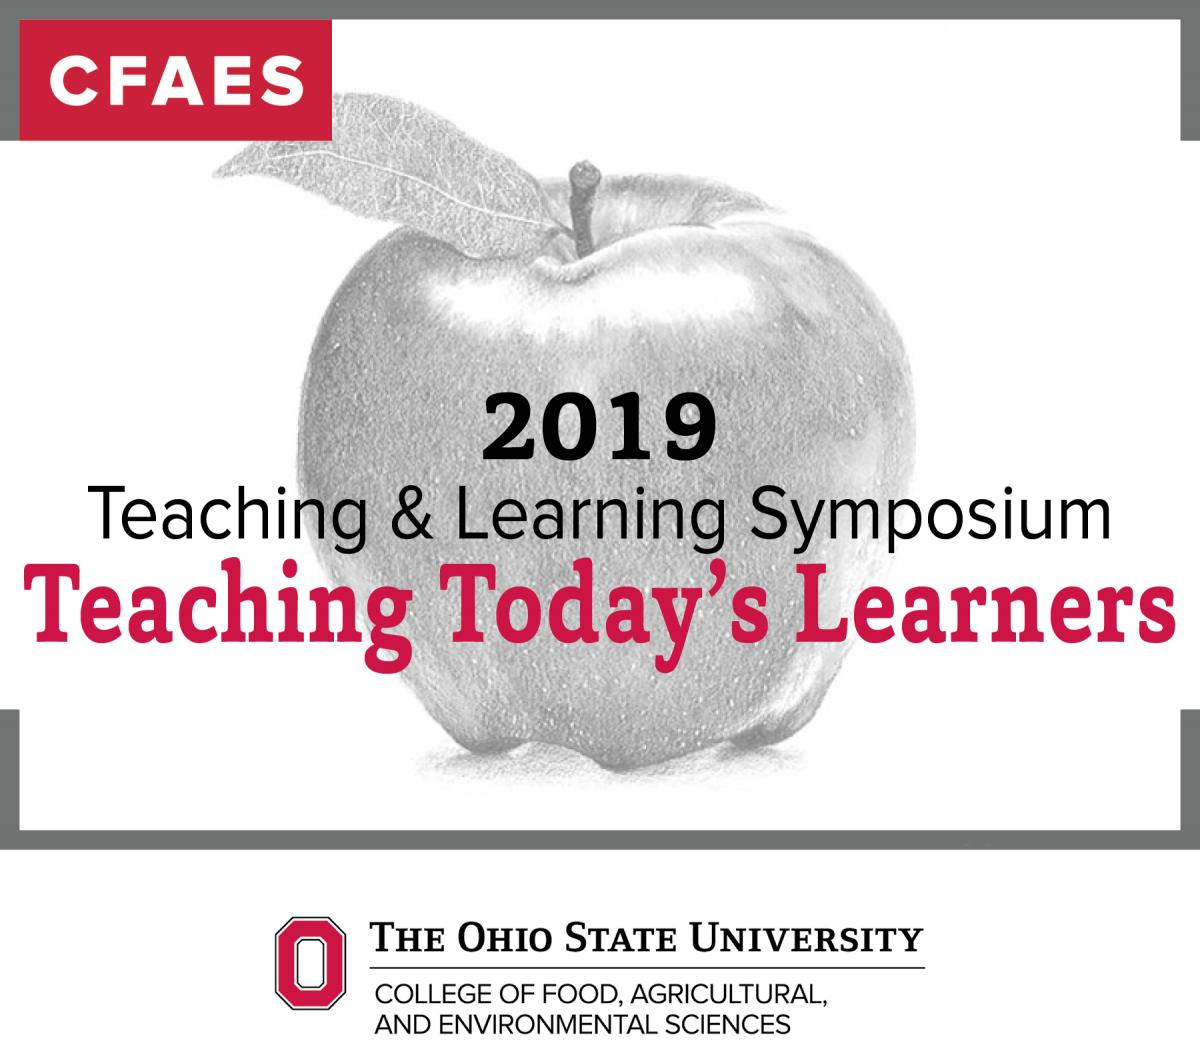 Teaching & Learning Symposium